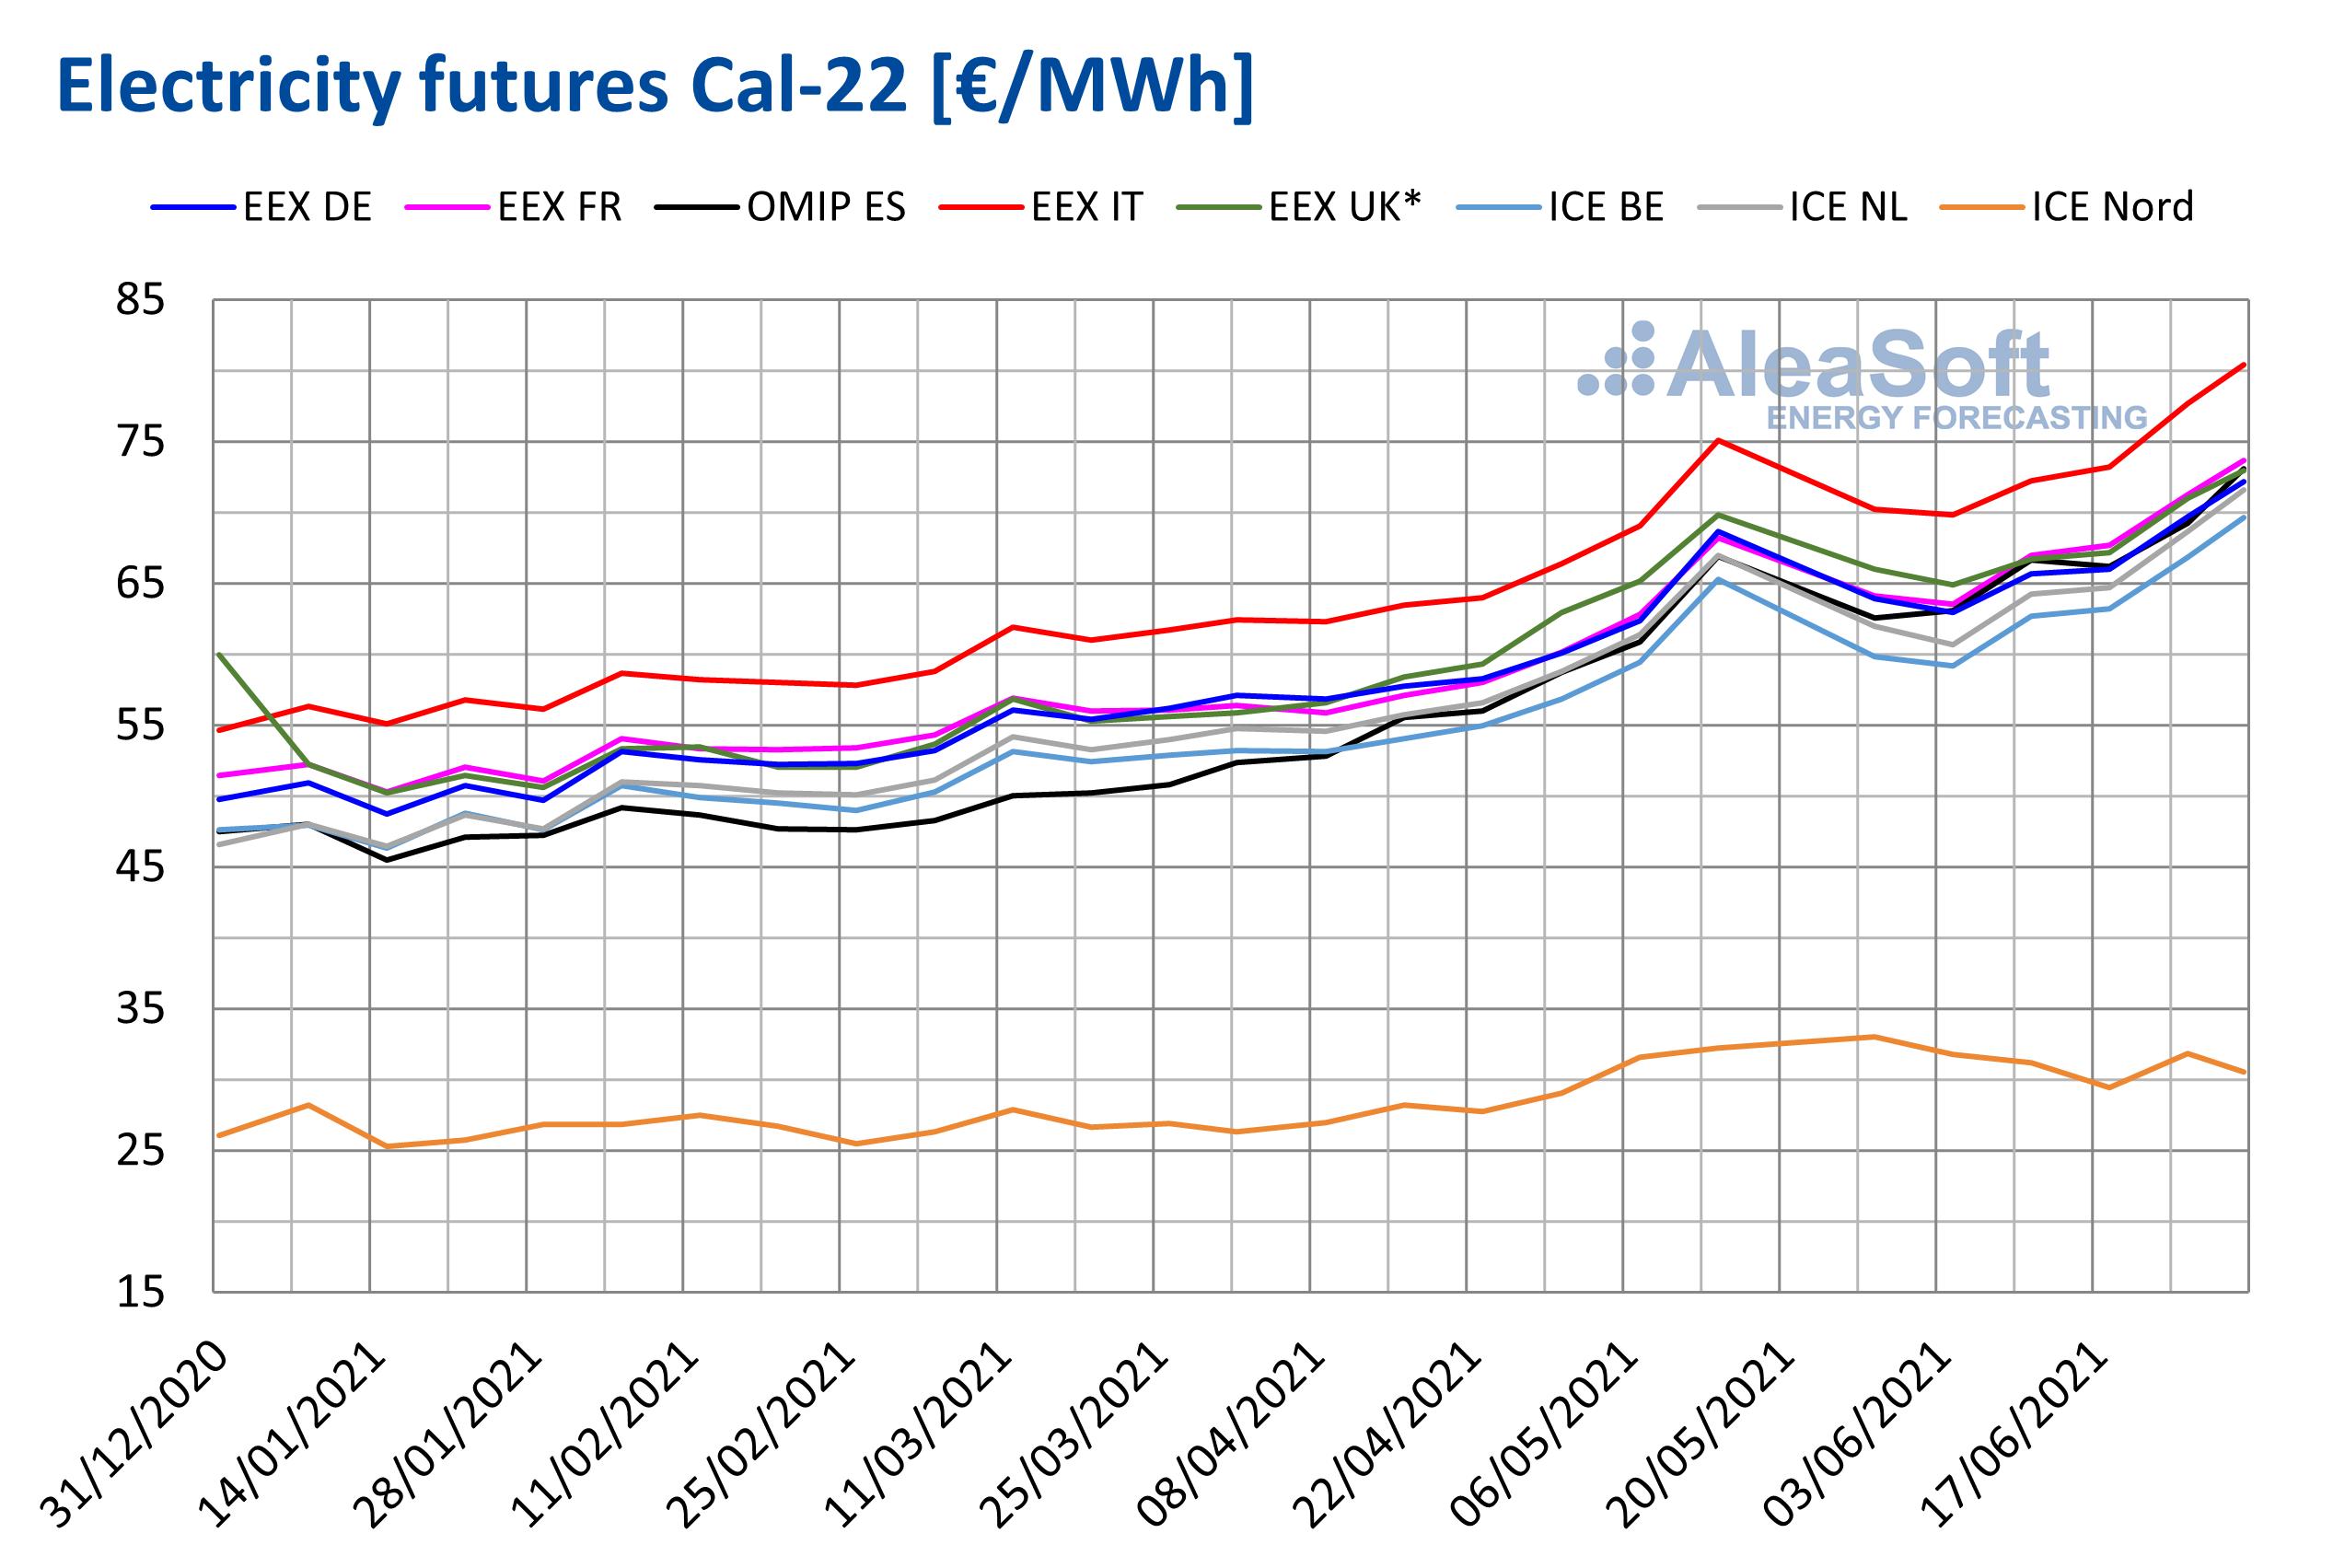 AleaSoft - Electricity future cal22 first half 2021